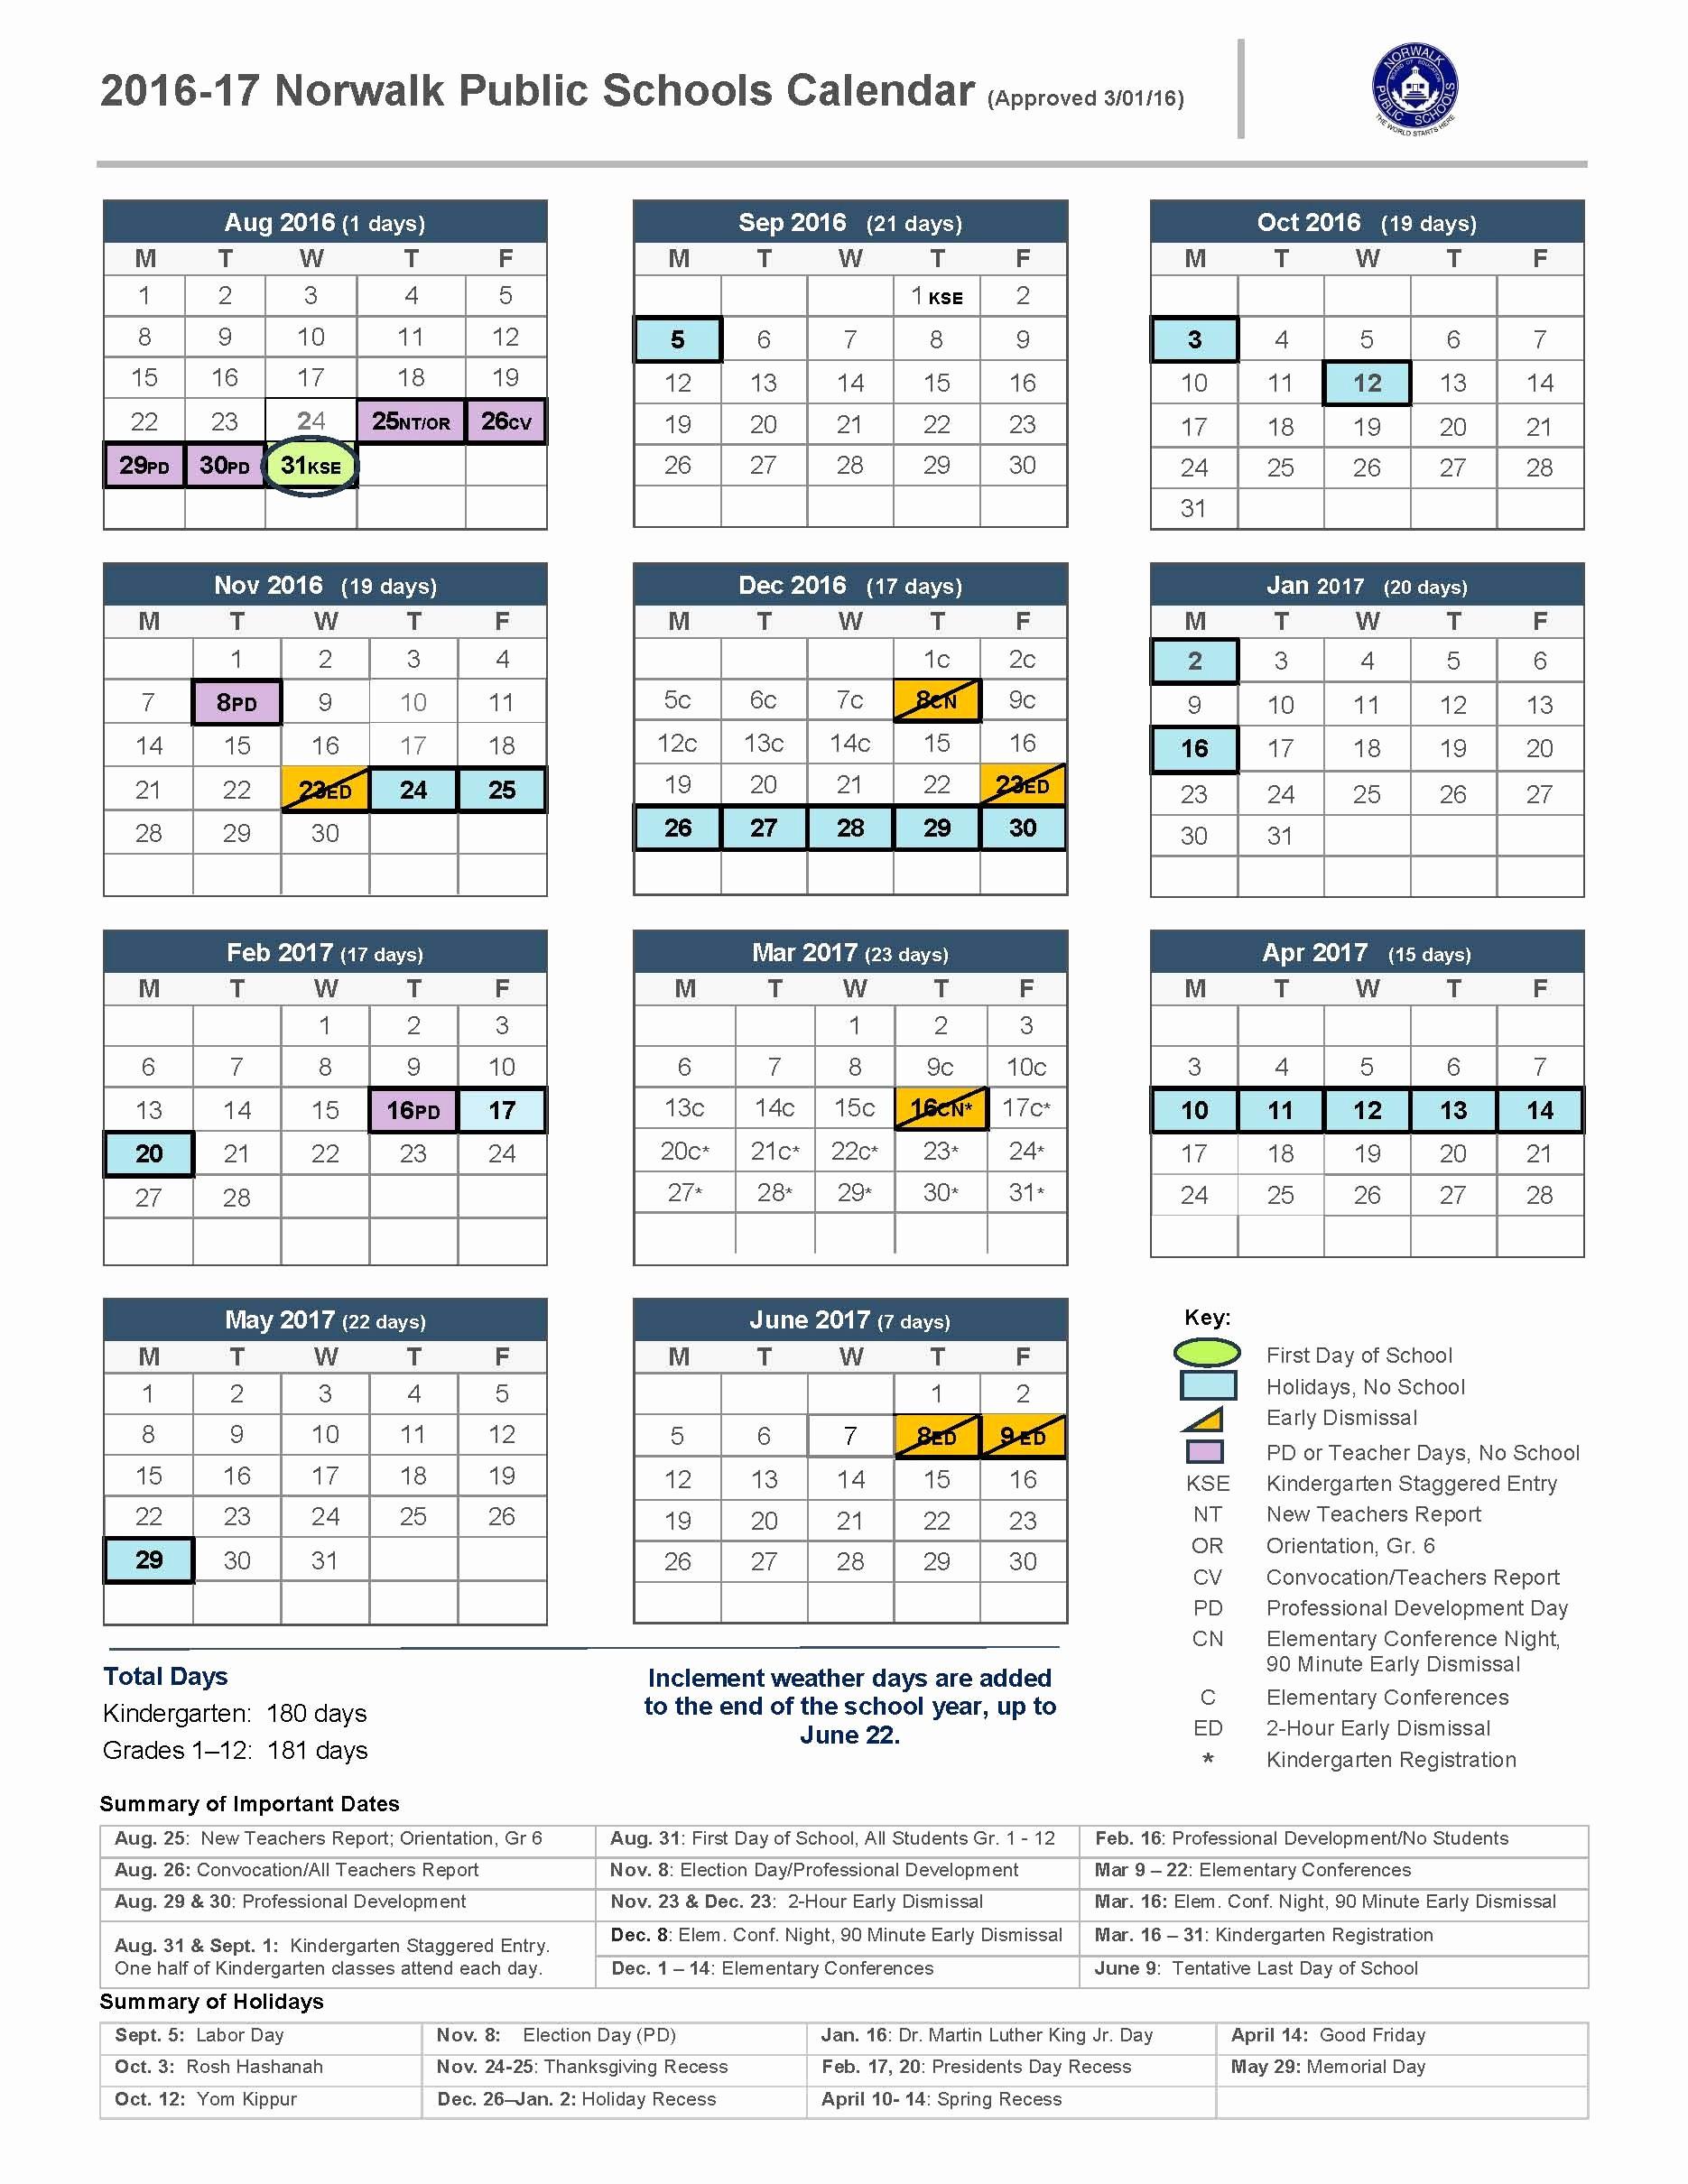 Calendar 2016-17 Template Beautiful 2016 17 School Calendar norwalk Public Schools